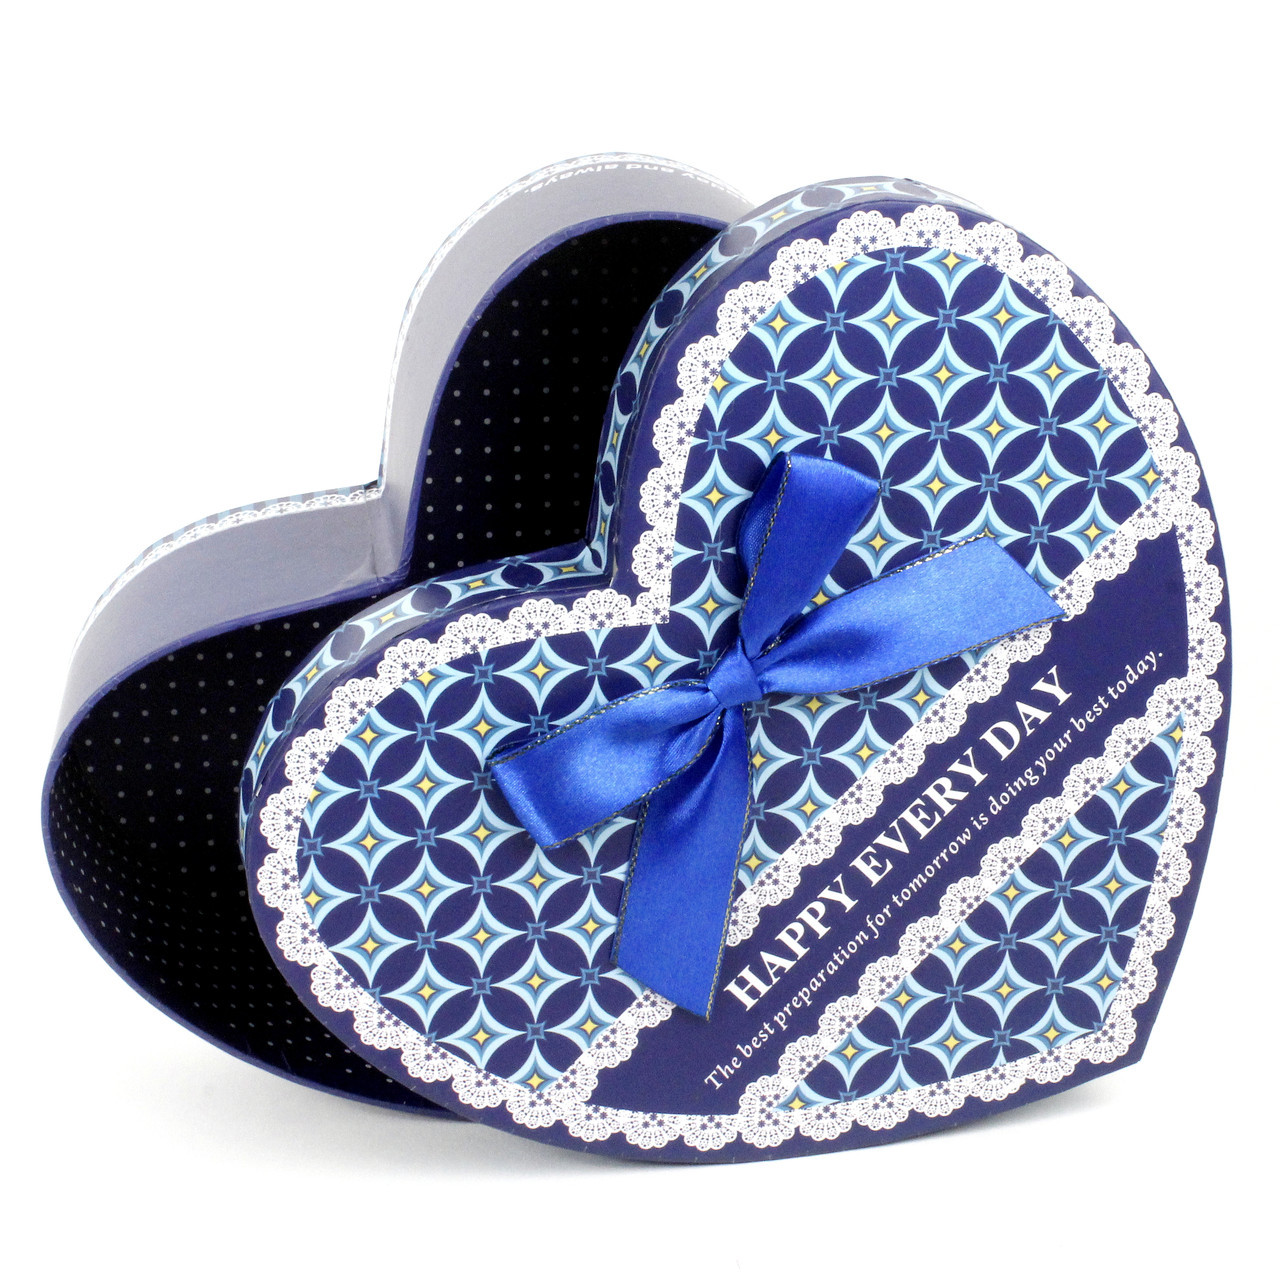 Подарочная коробка в форме сердца синяя 27 х 25 x 9 см